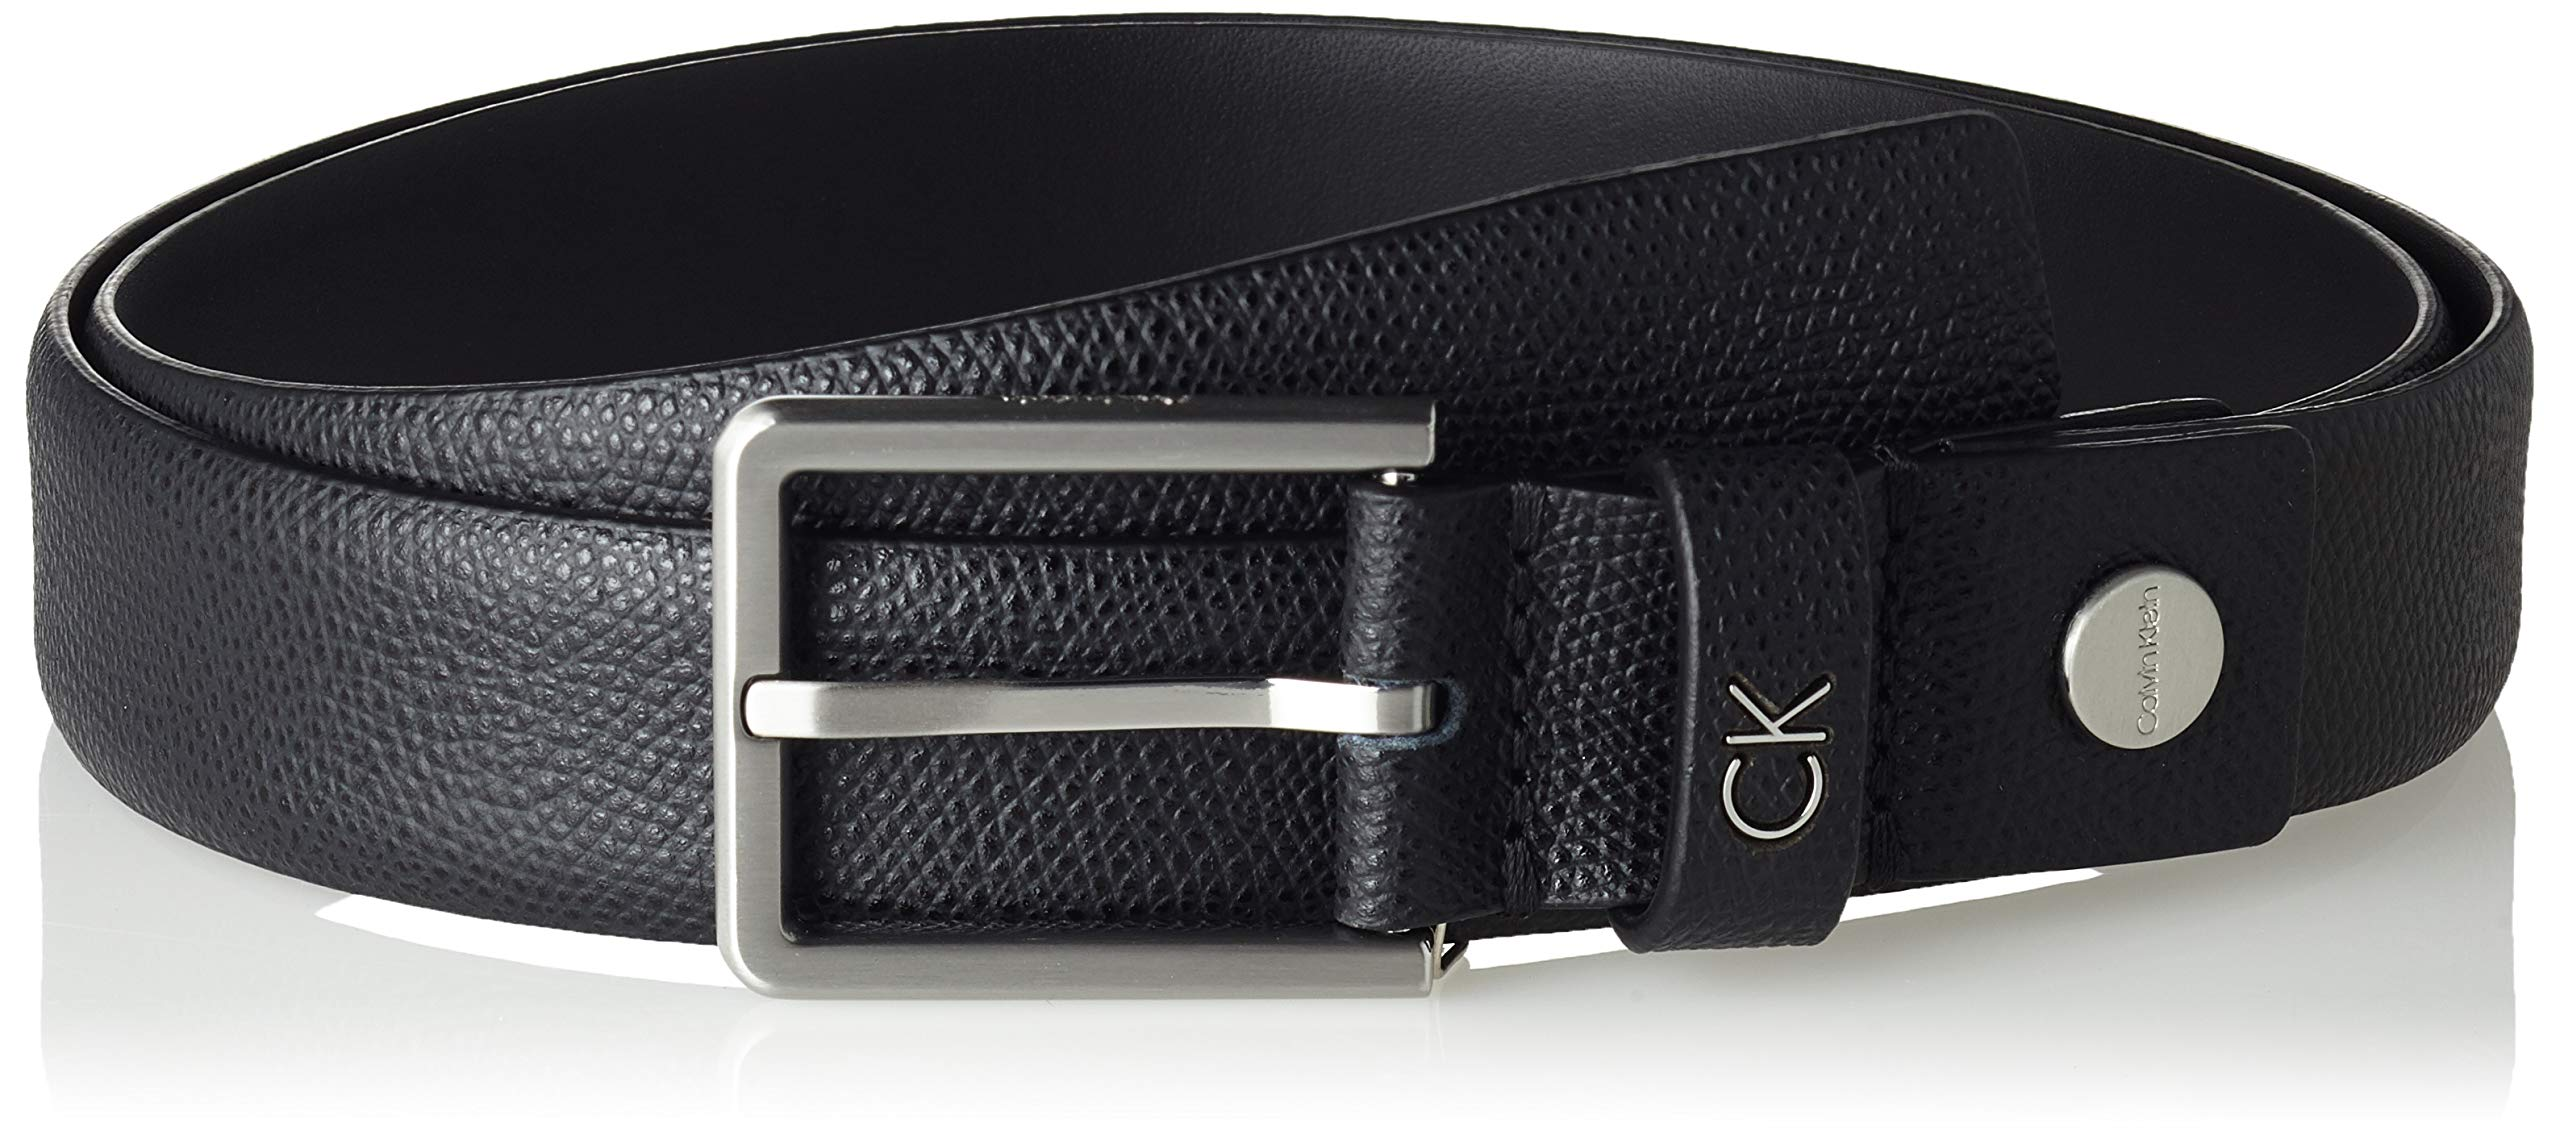 Adj Fabricant115Homme Formal Calvin palmellato 3cm CeintureNoirblack Klein Belt 001130taille 4AjL5R